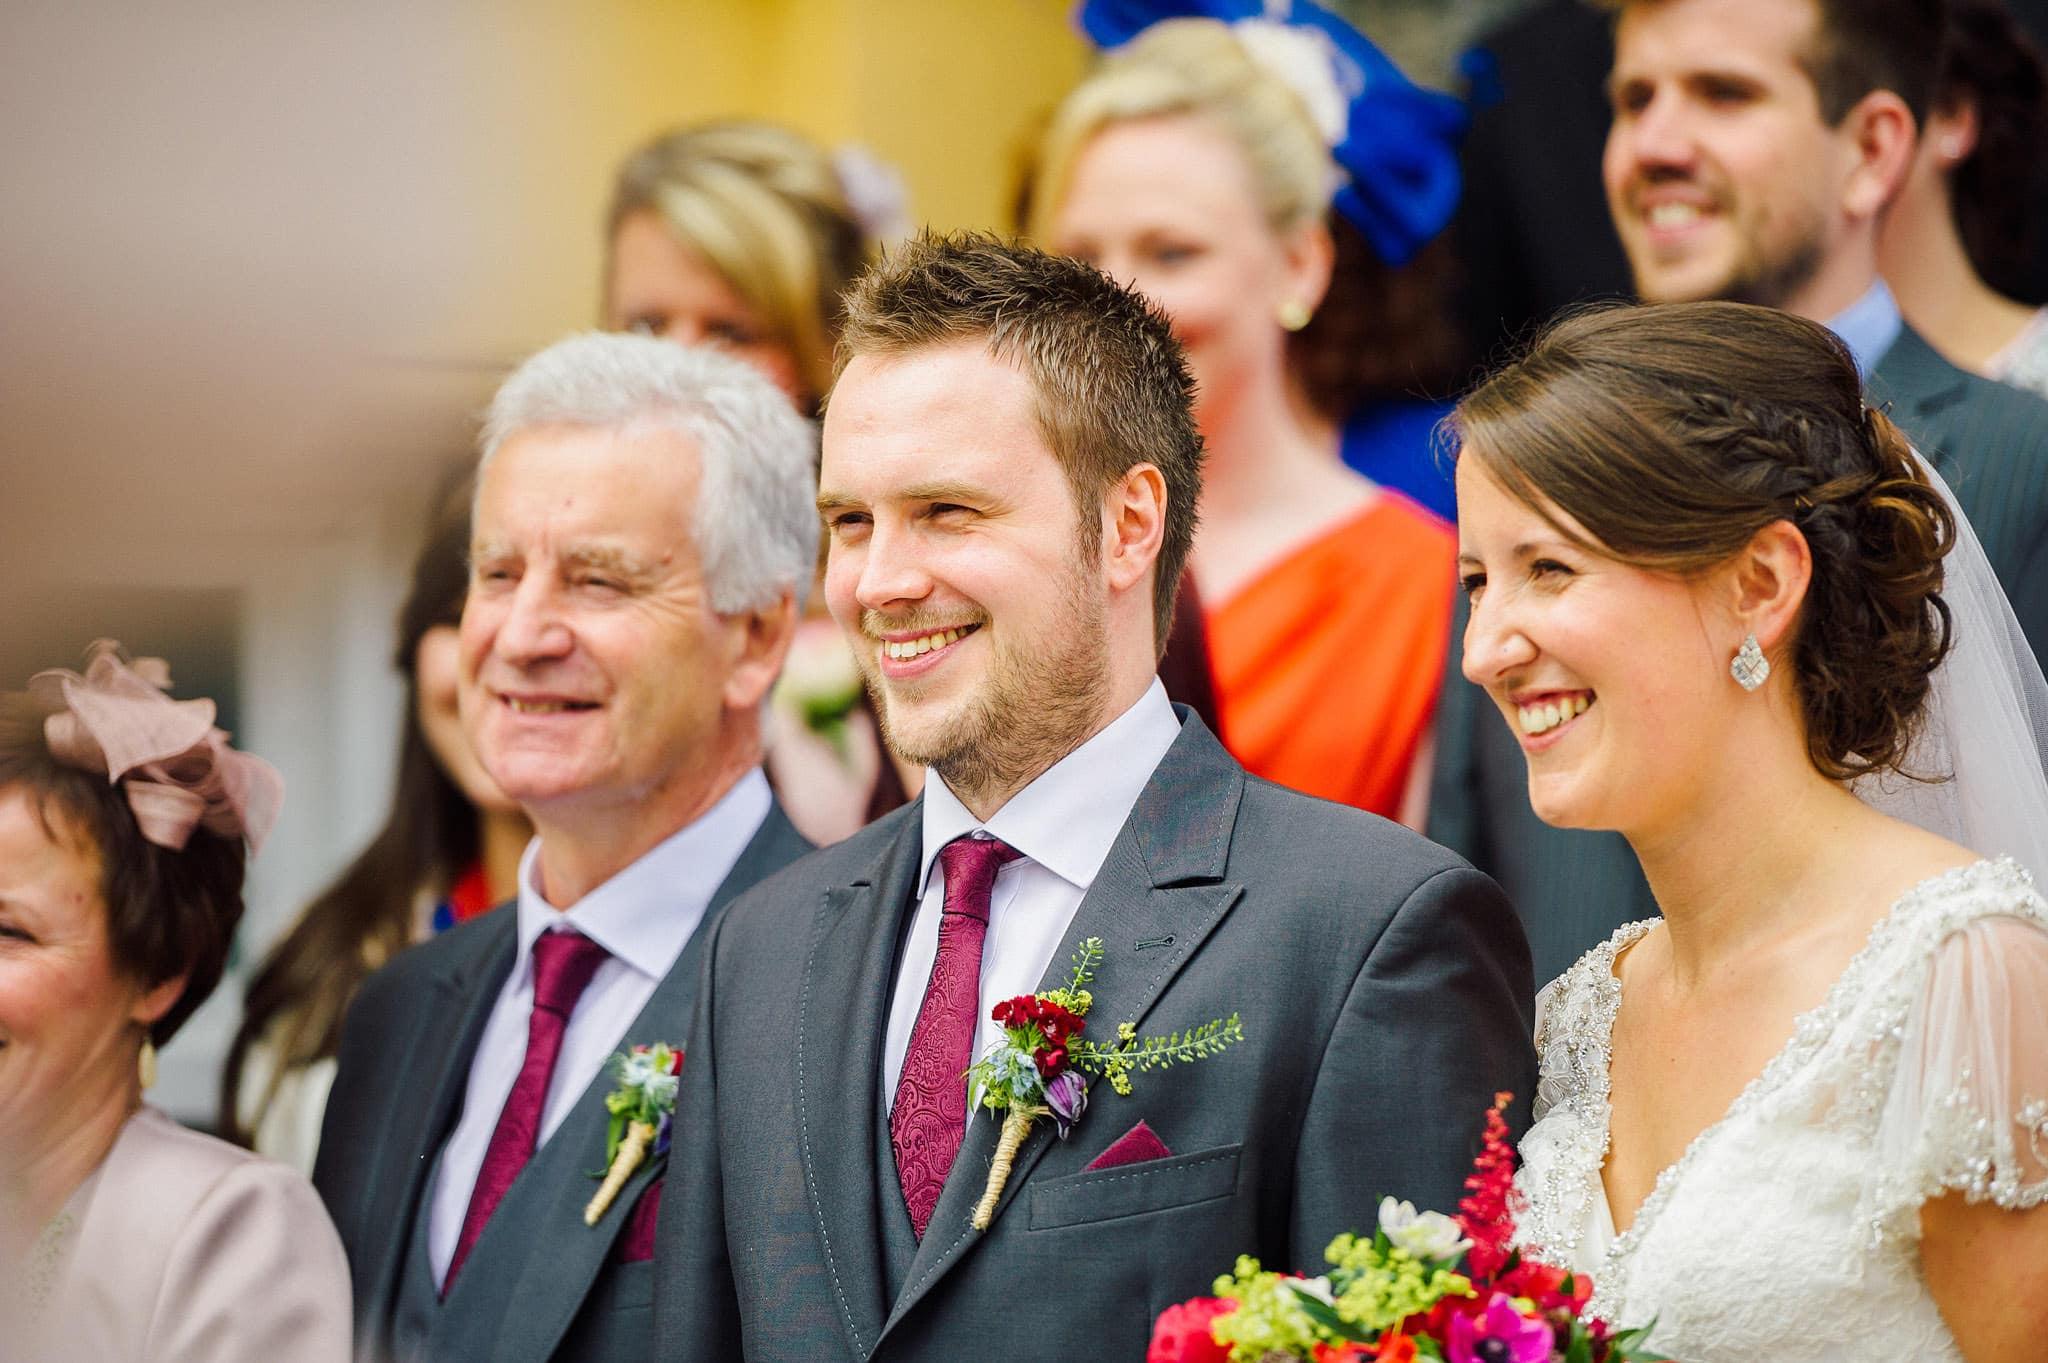 wedding-photographer-aberystwyth-wales (71)